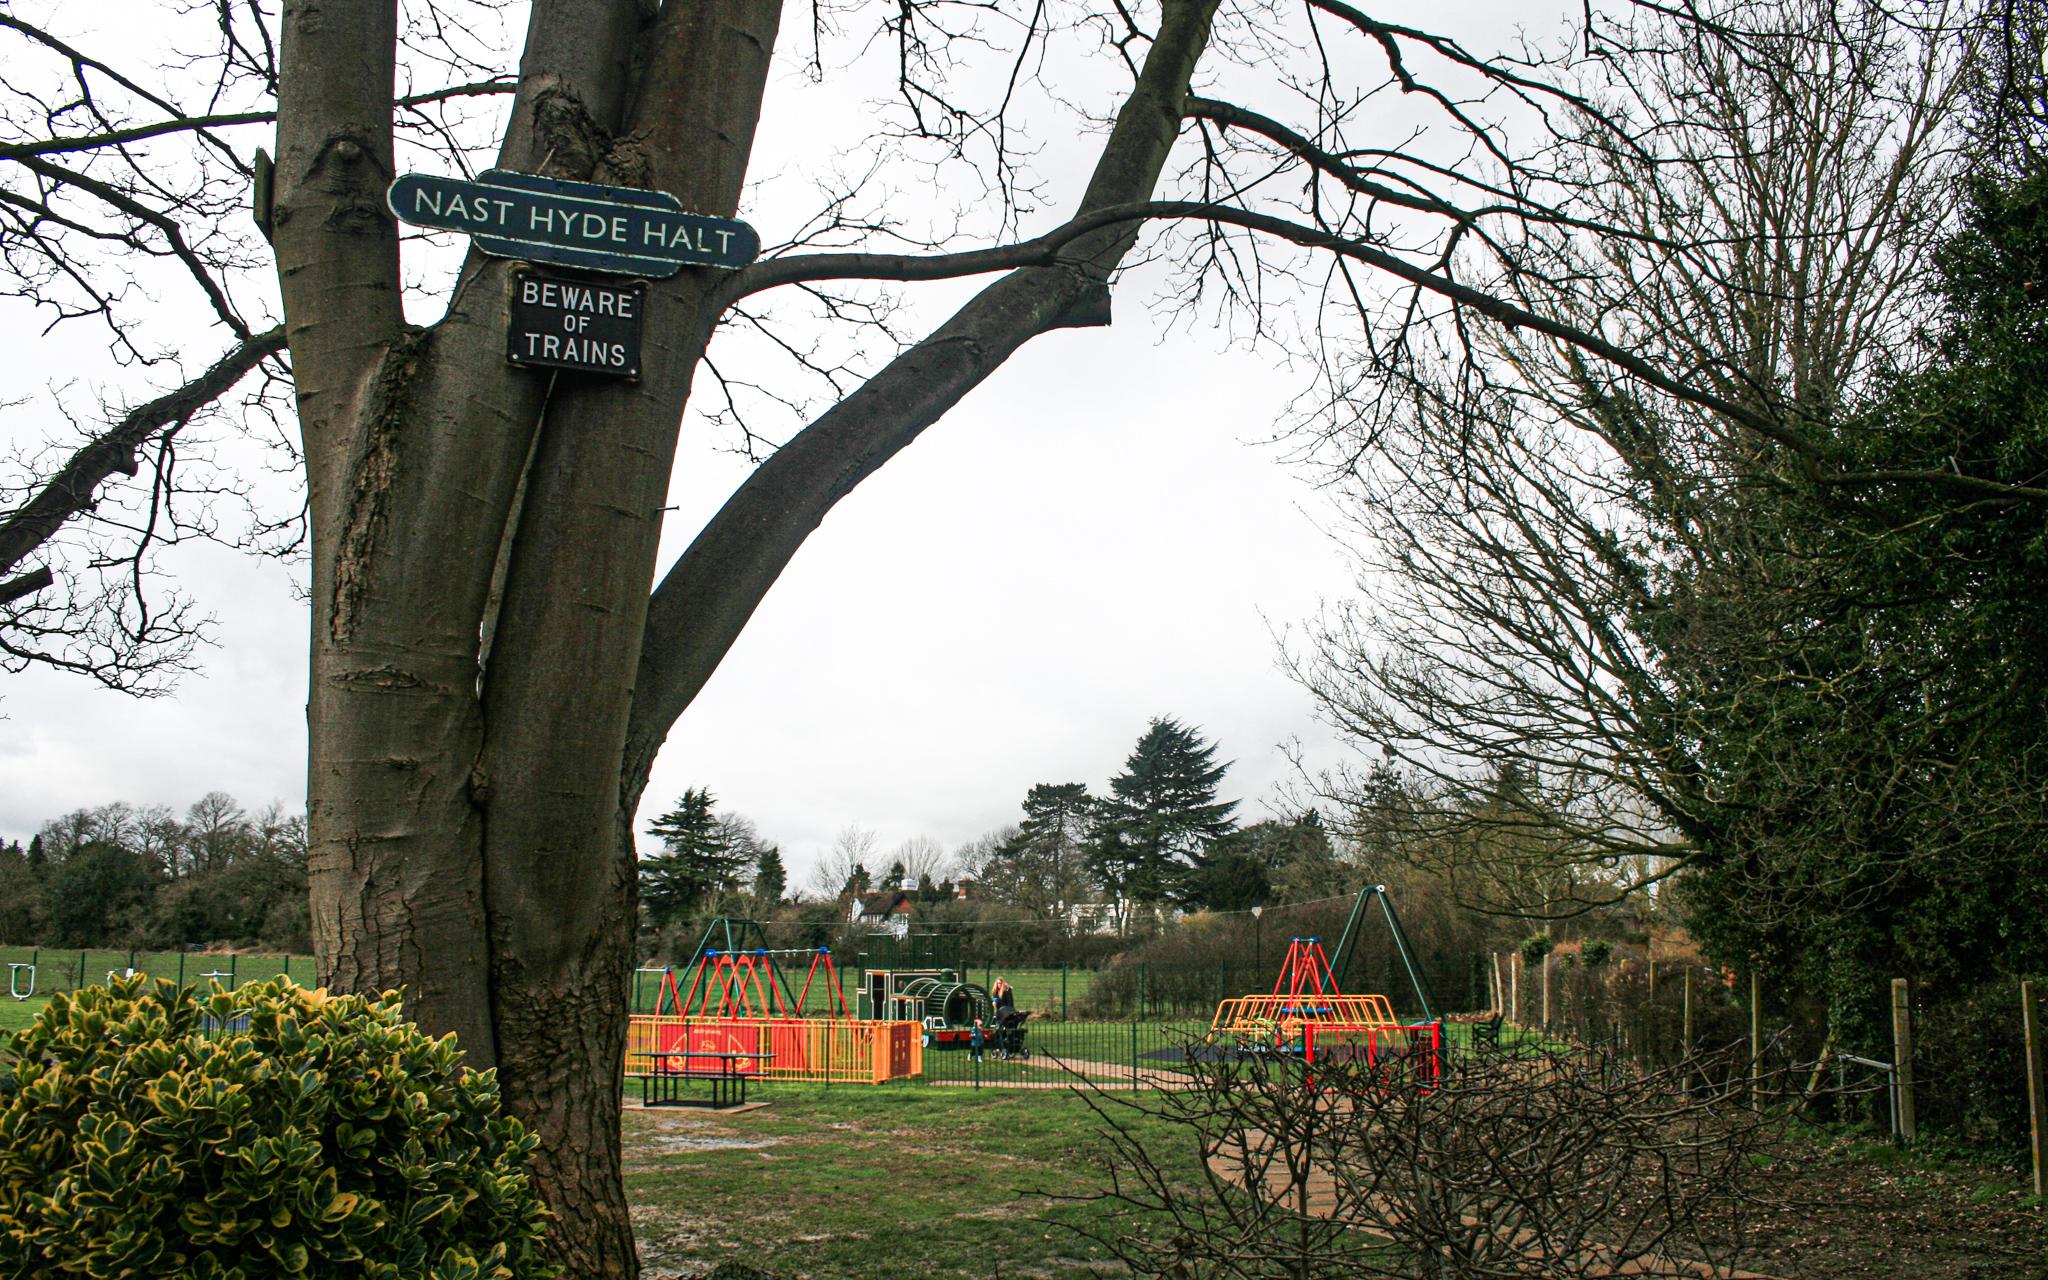 Ellenbrook Play Area